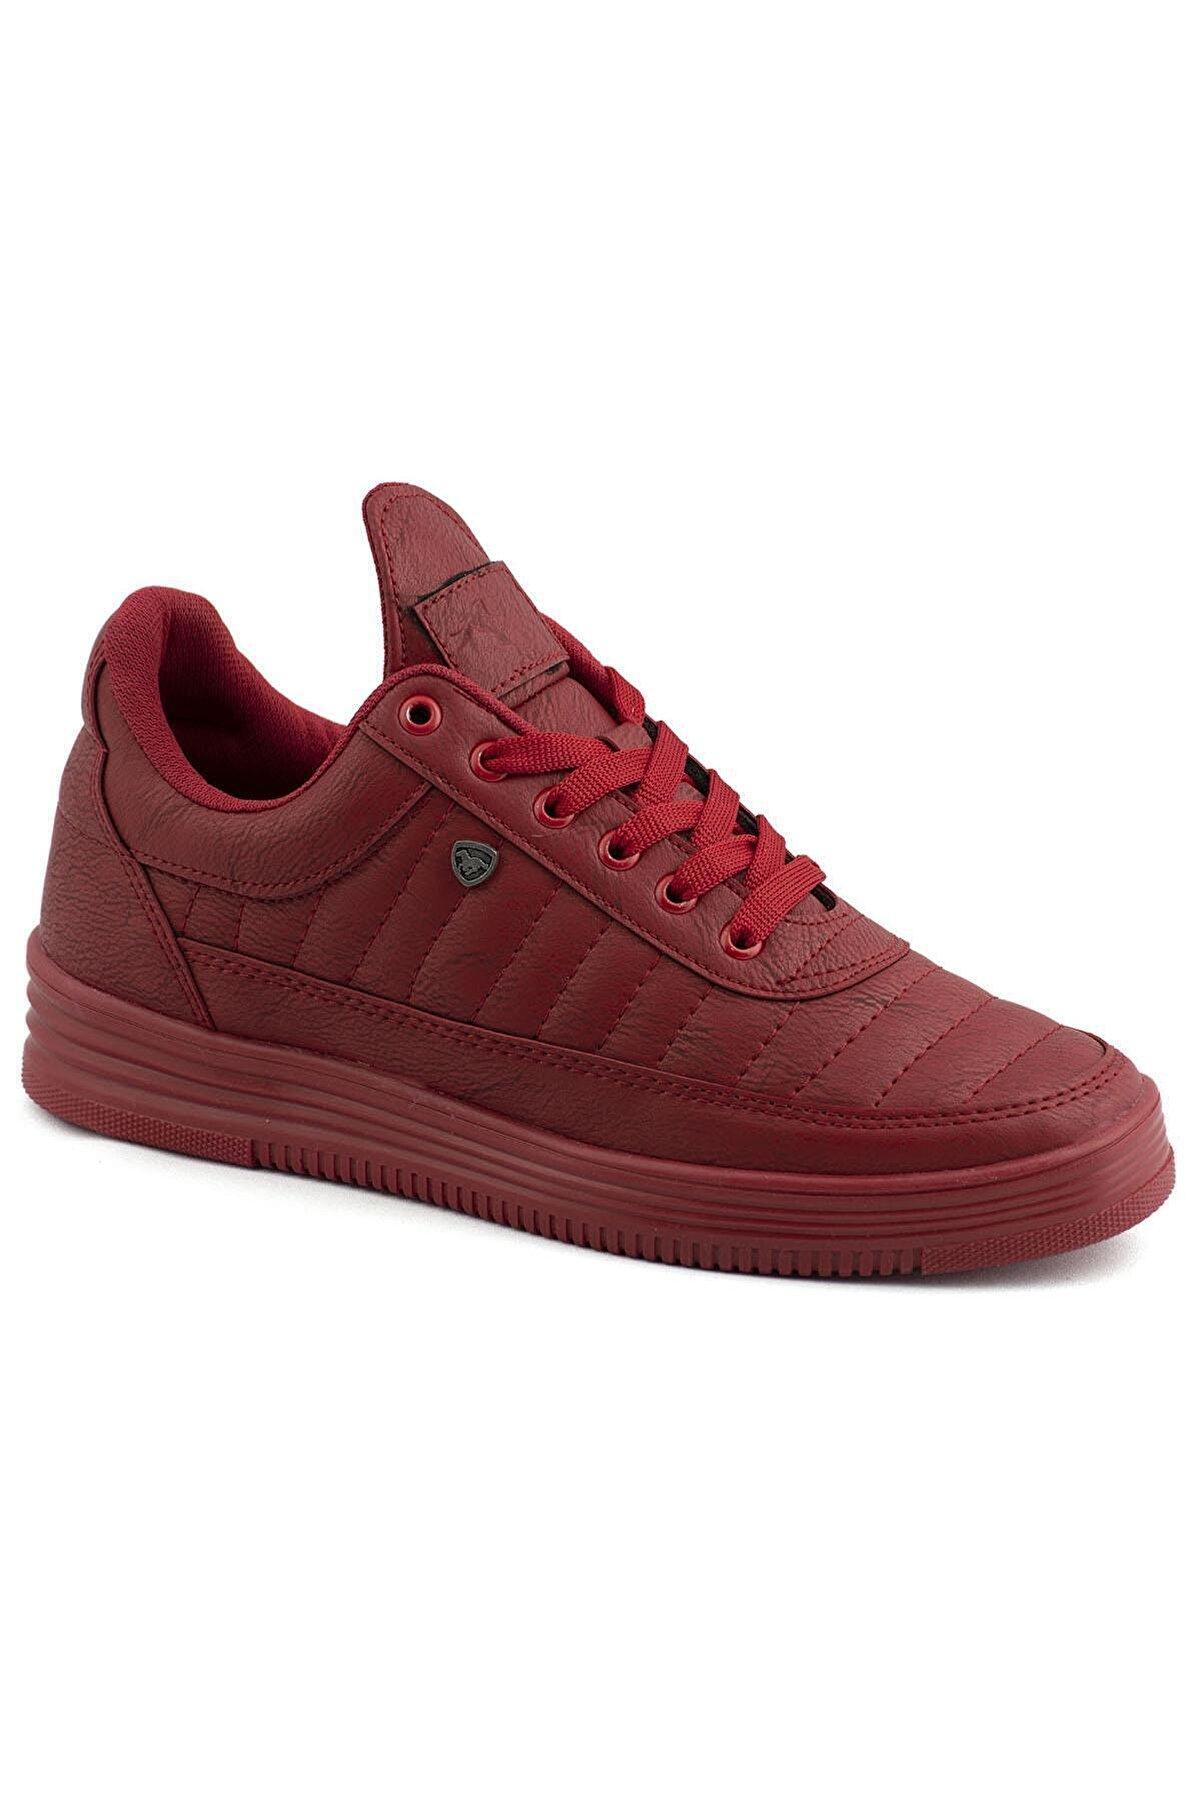 L.A Polo 07 Kırmızı Kırmızı Dikişli Unisex Spor Ayakkabı